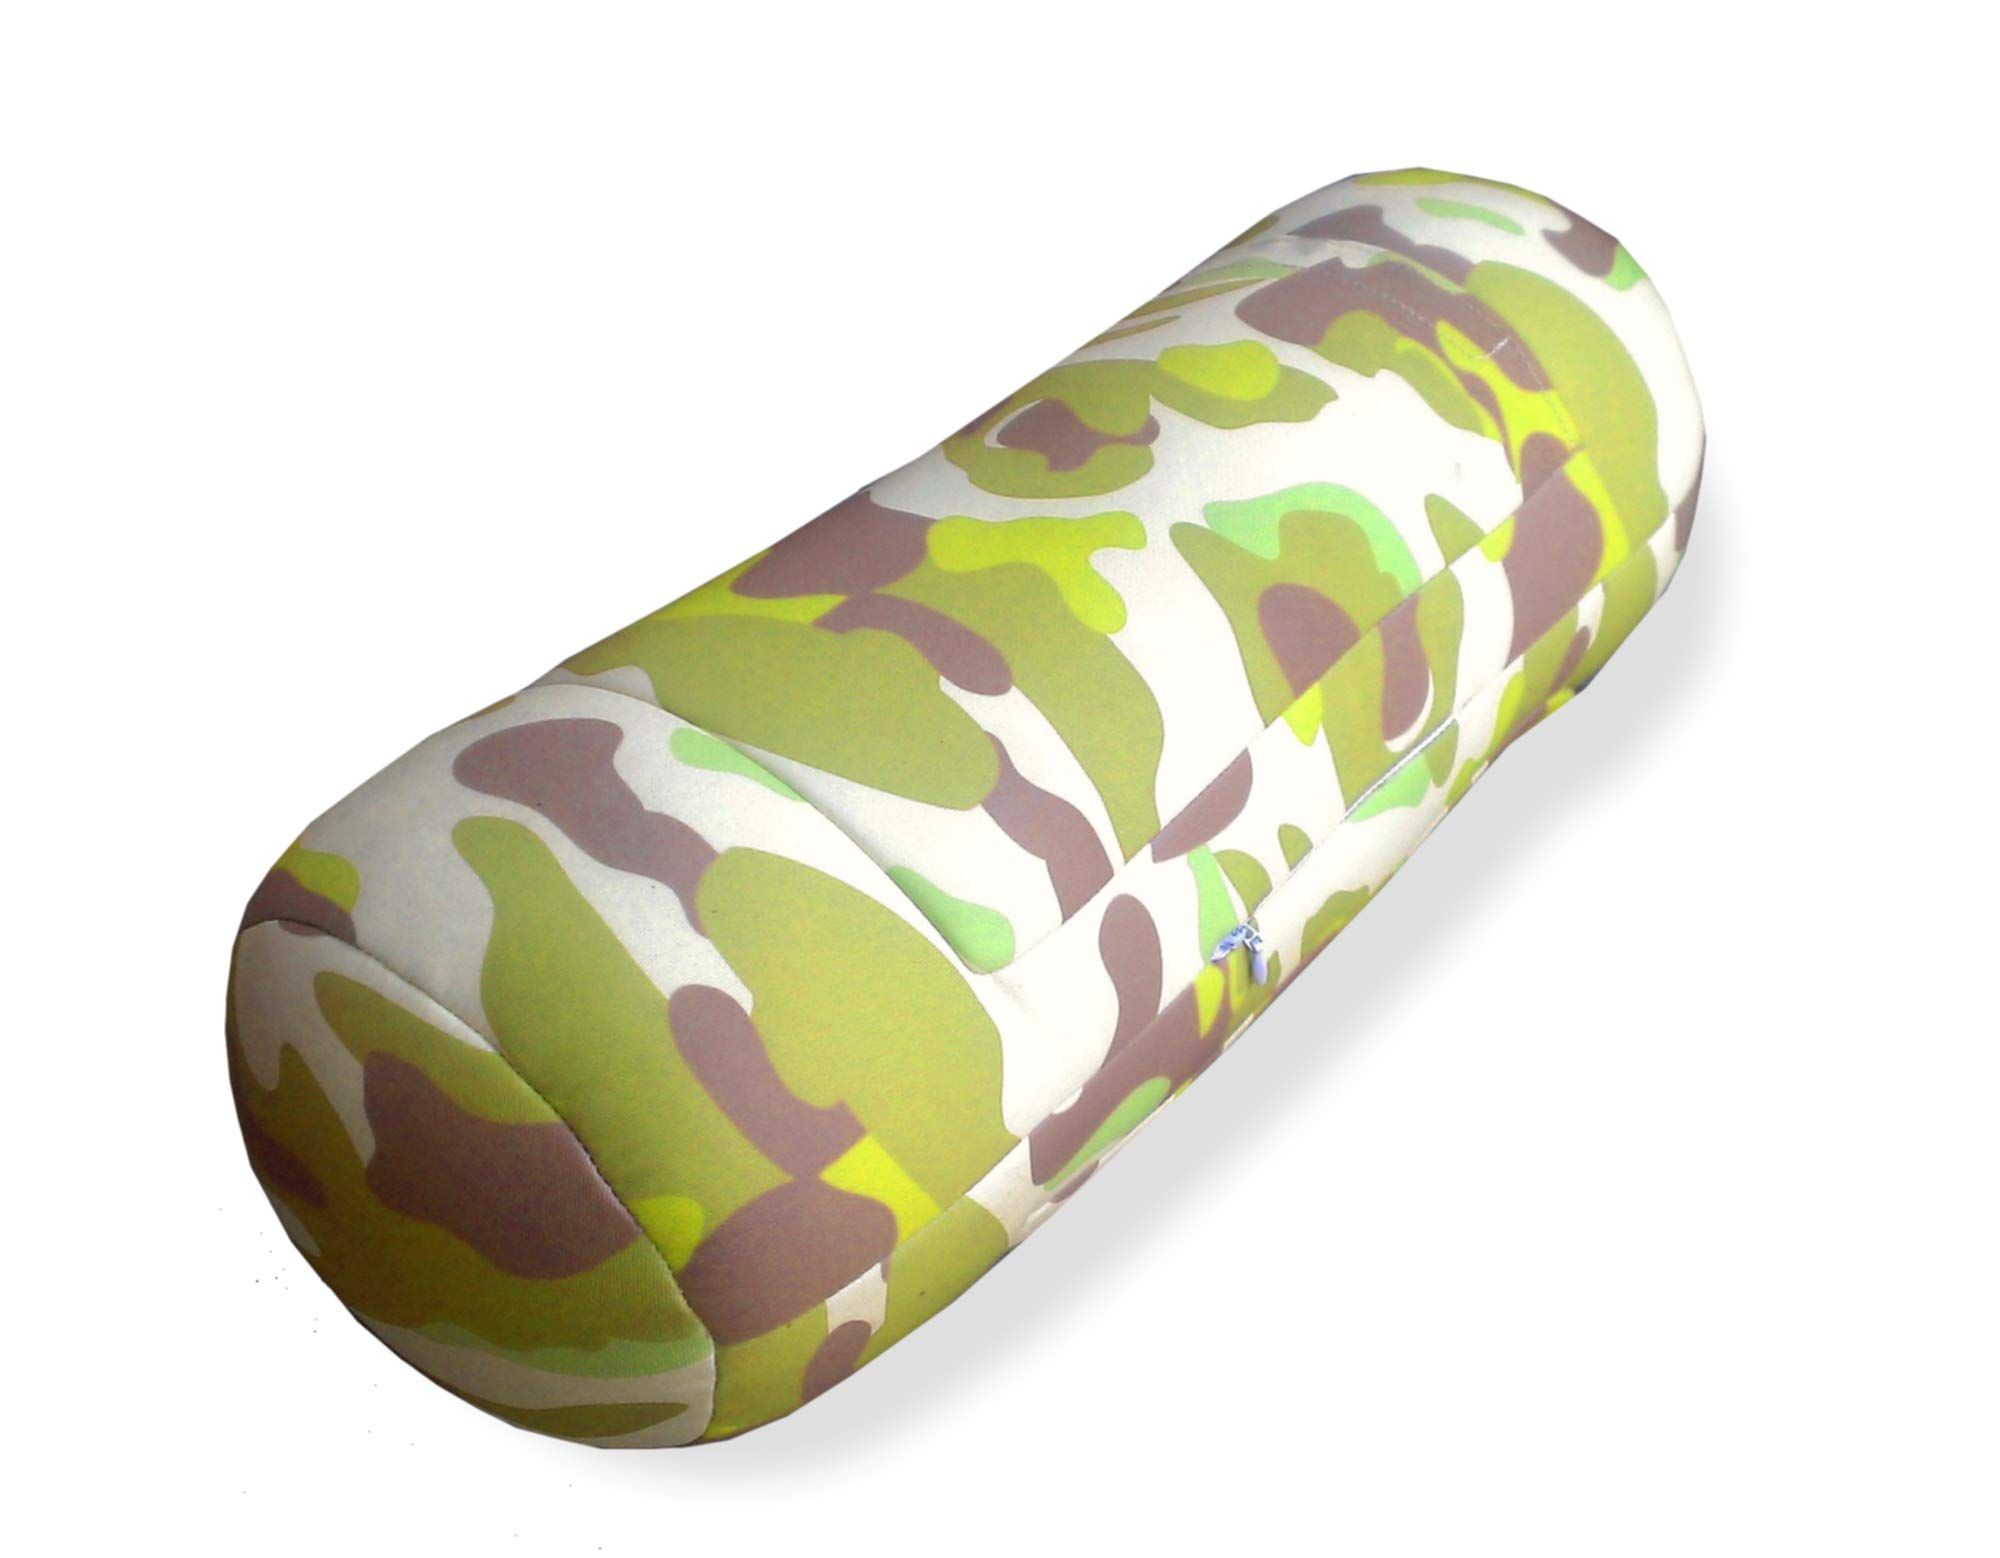 Senseez 3 in 1 Therapeutic Sensory Pillow Camo Adaptables